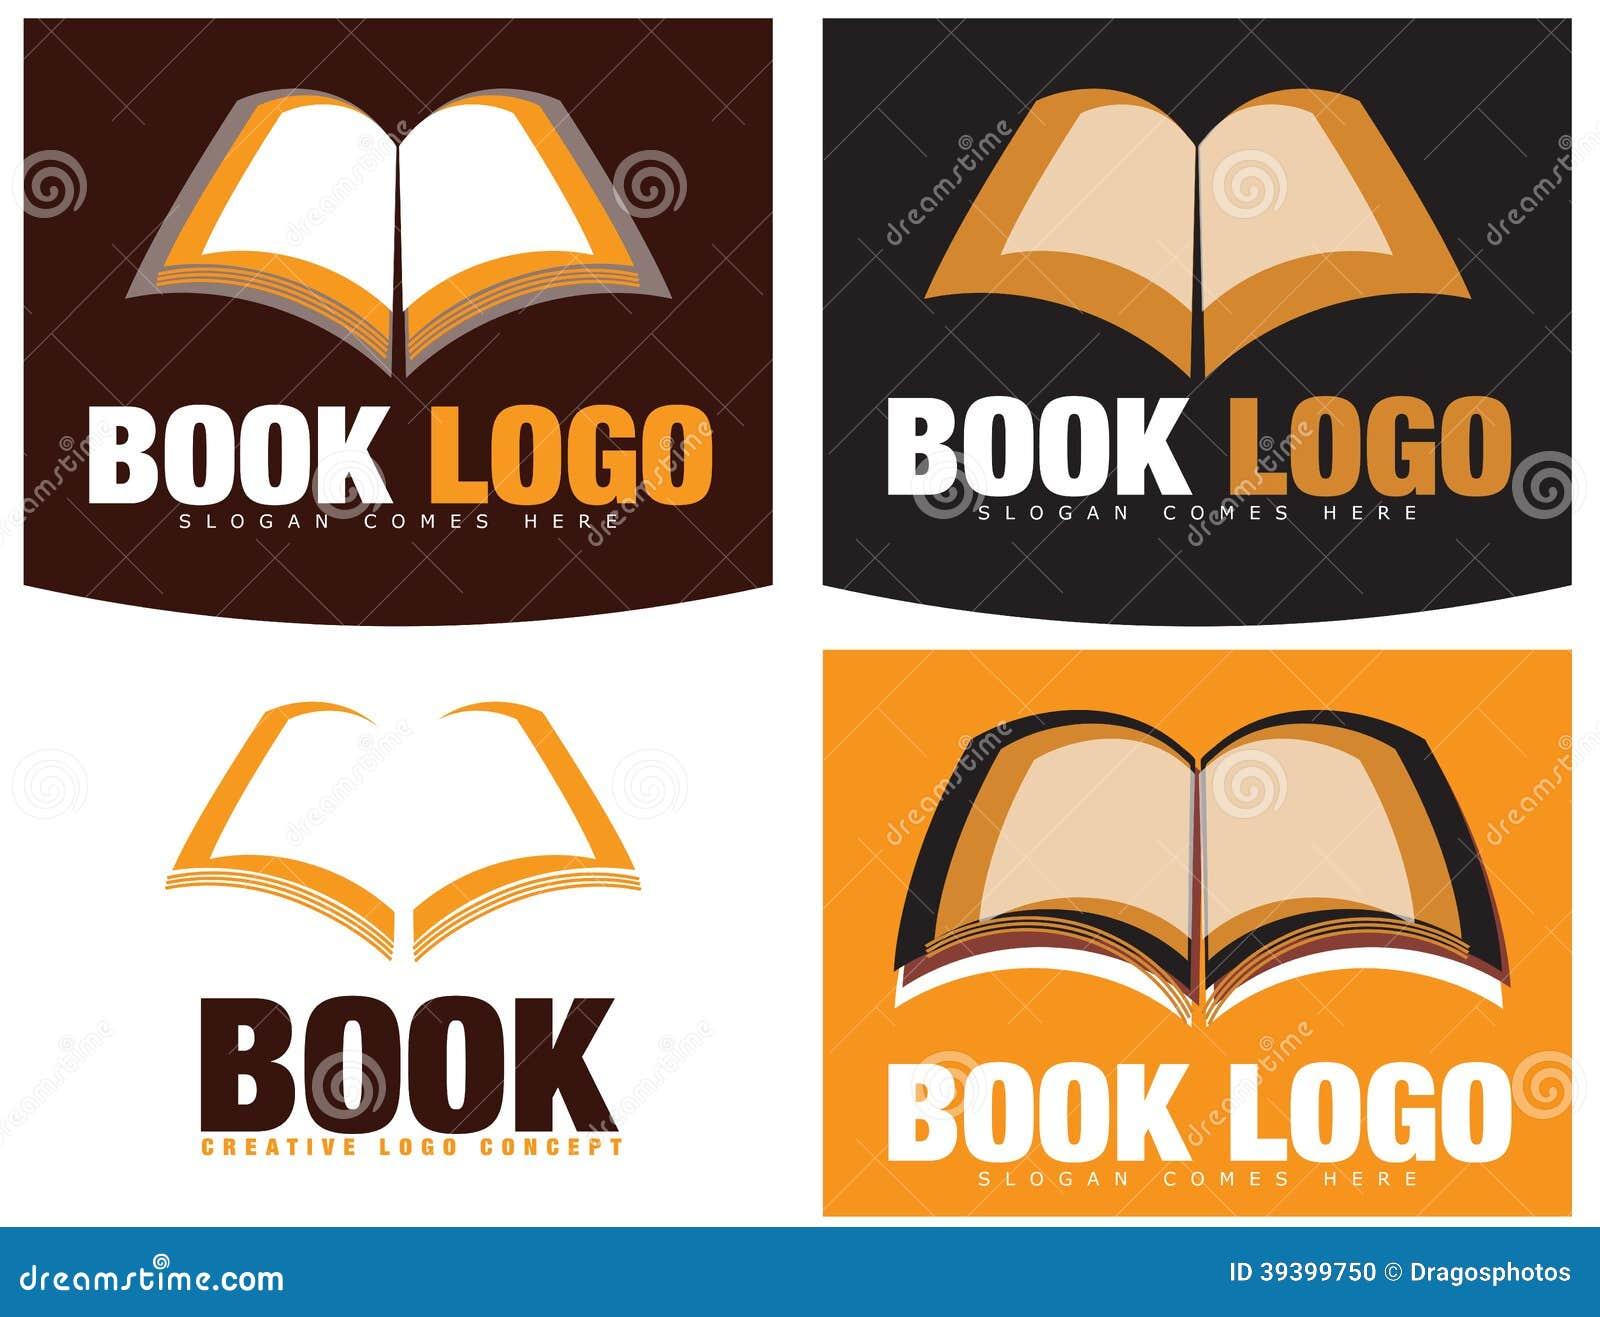 Book logos stock vector image 42714029 - Logo Della Libreria O Del Libro Fotografia Stock